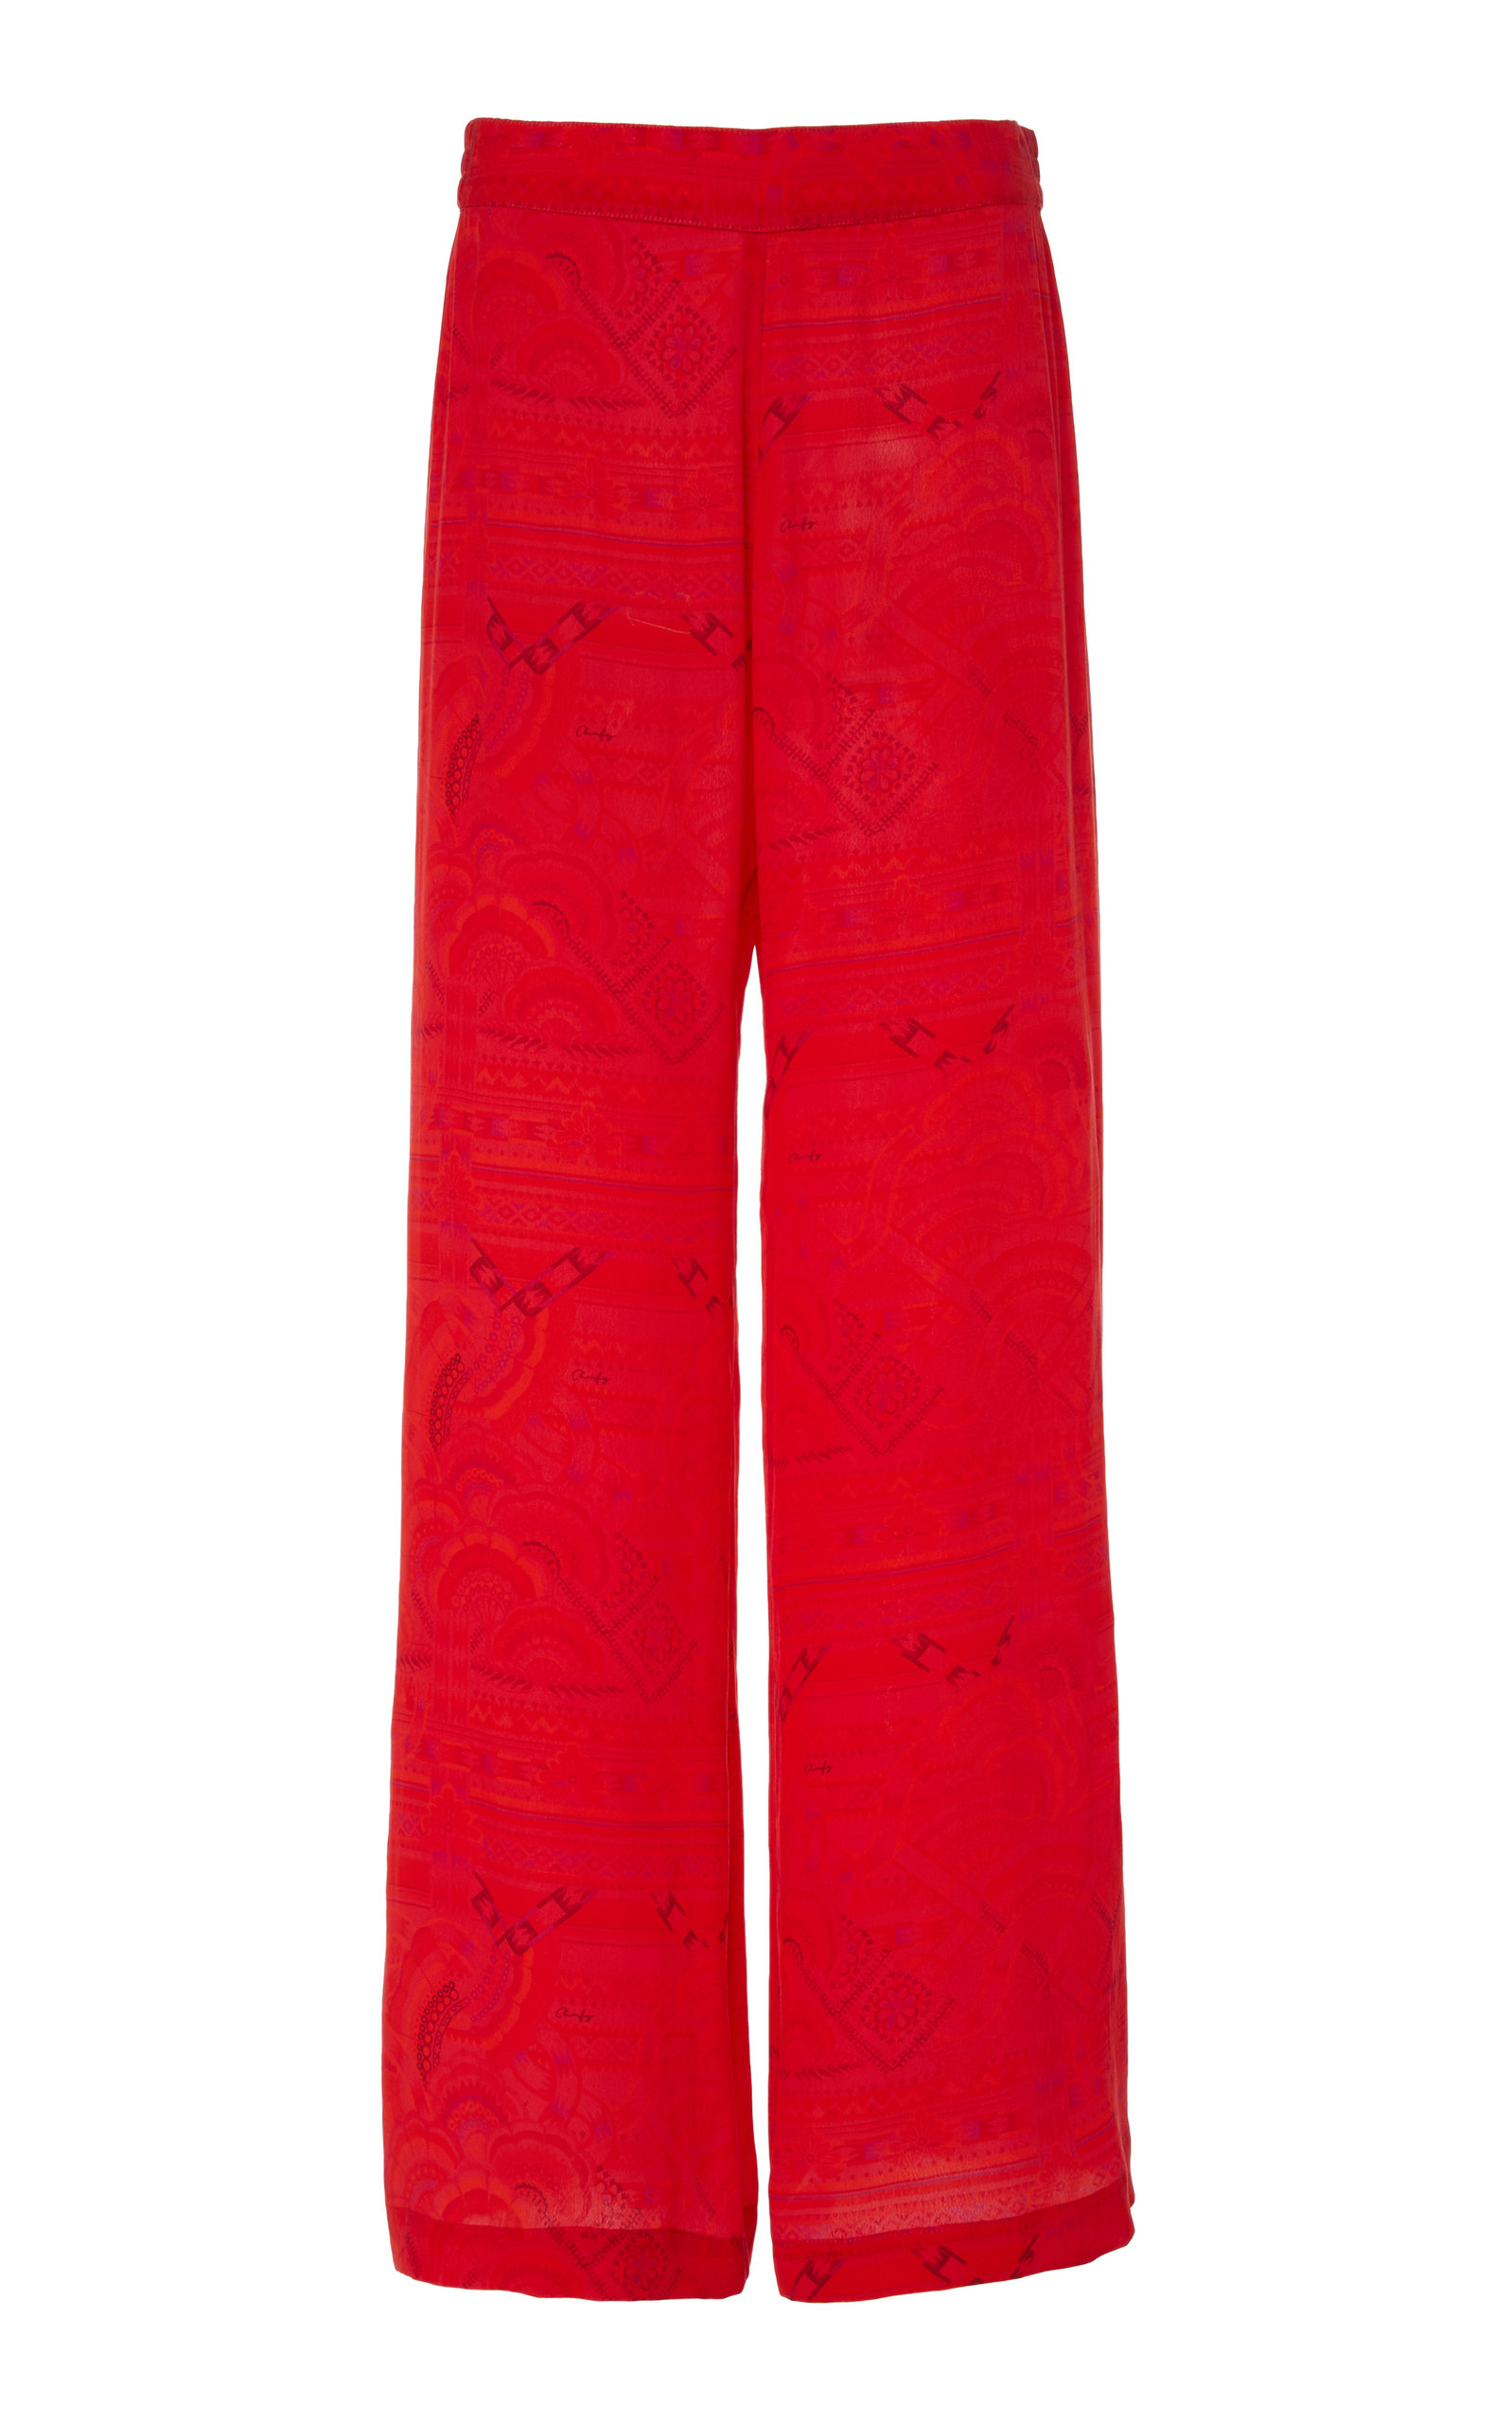 Chufy Pants HUANCAYO BROADCLOTH WIDE-LEG PANTS